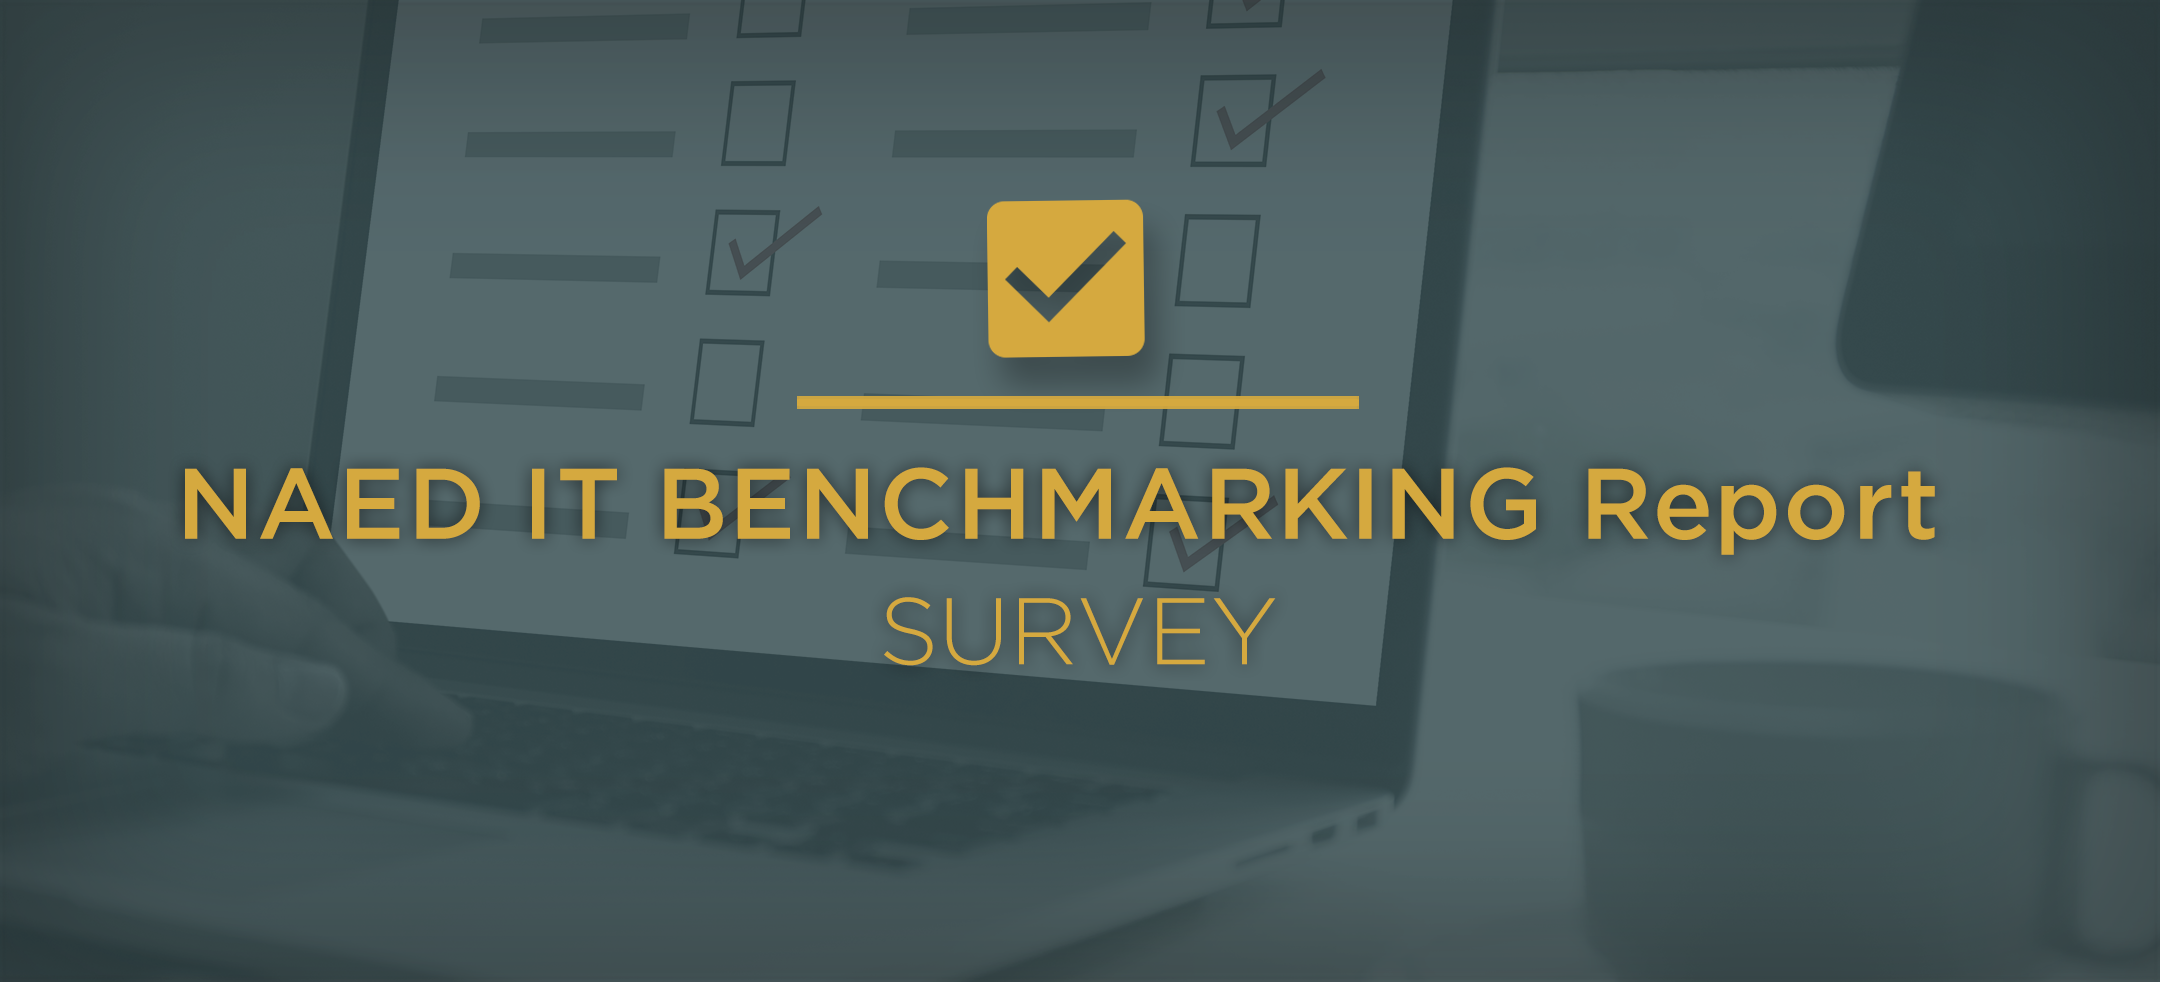 IT-Survey-Header-1.png